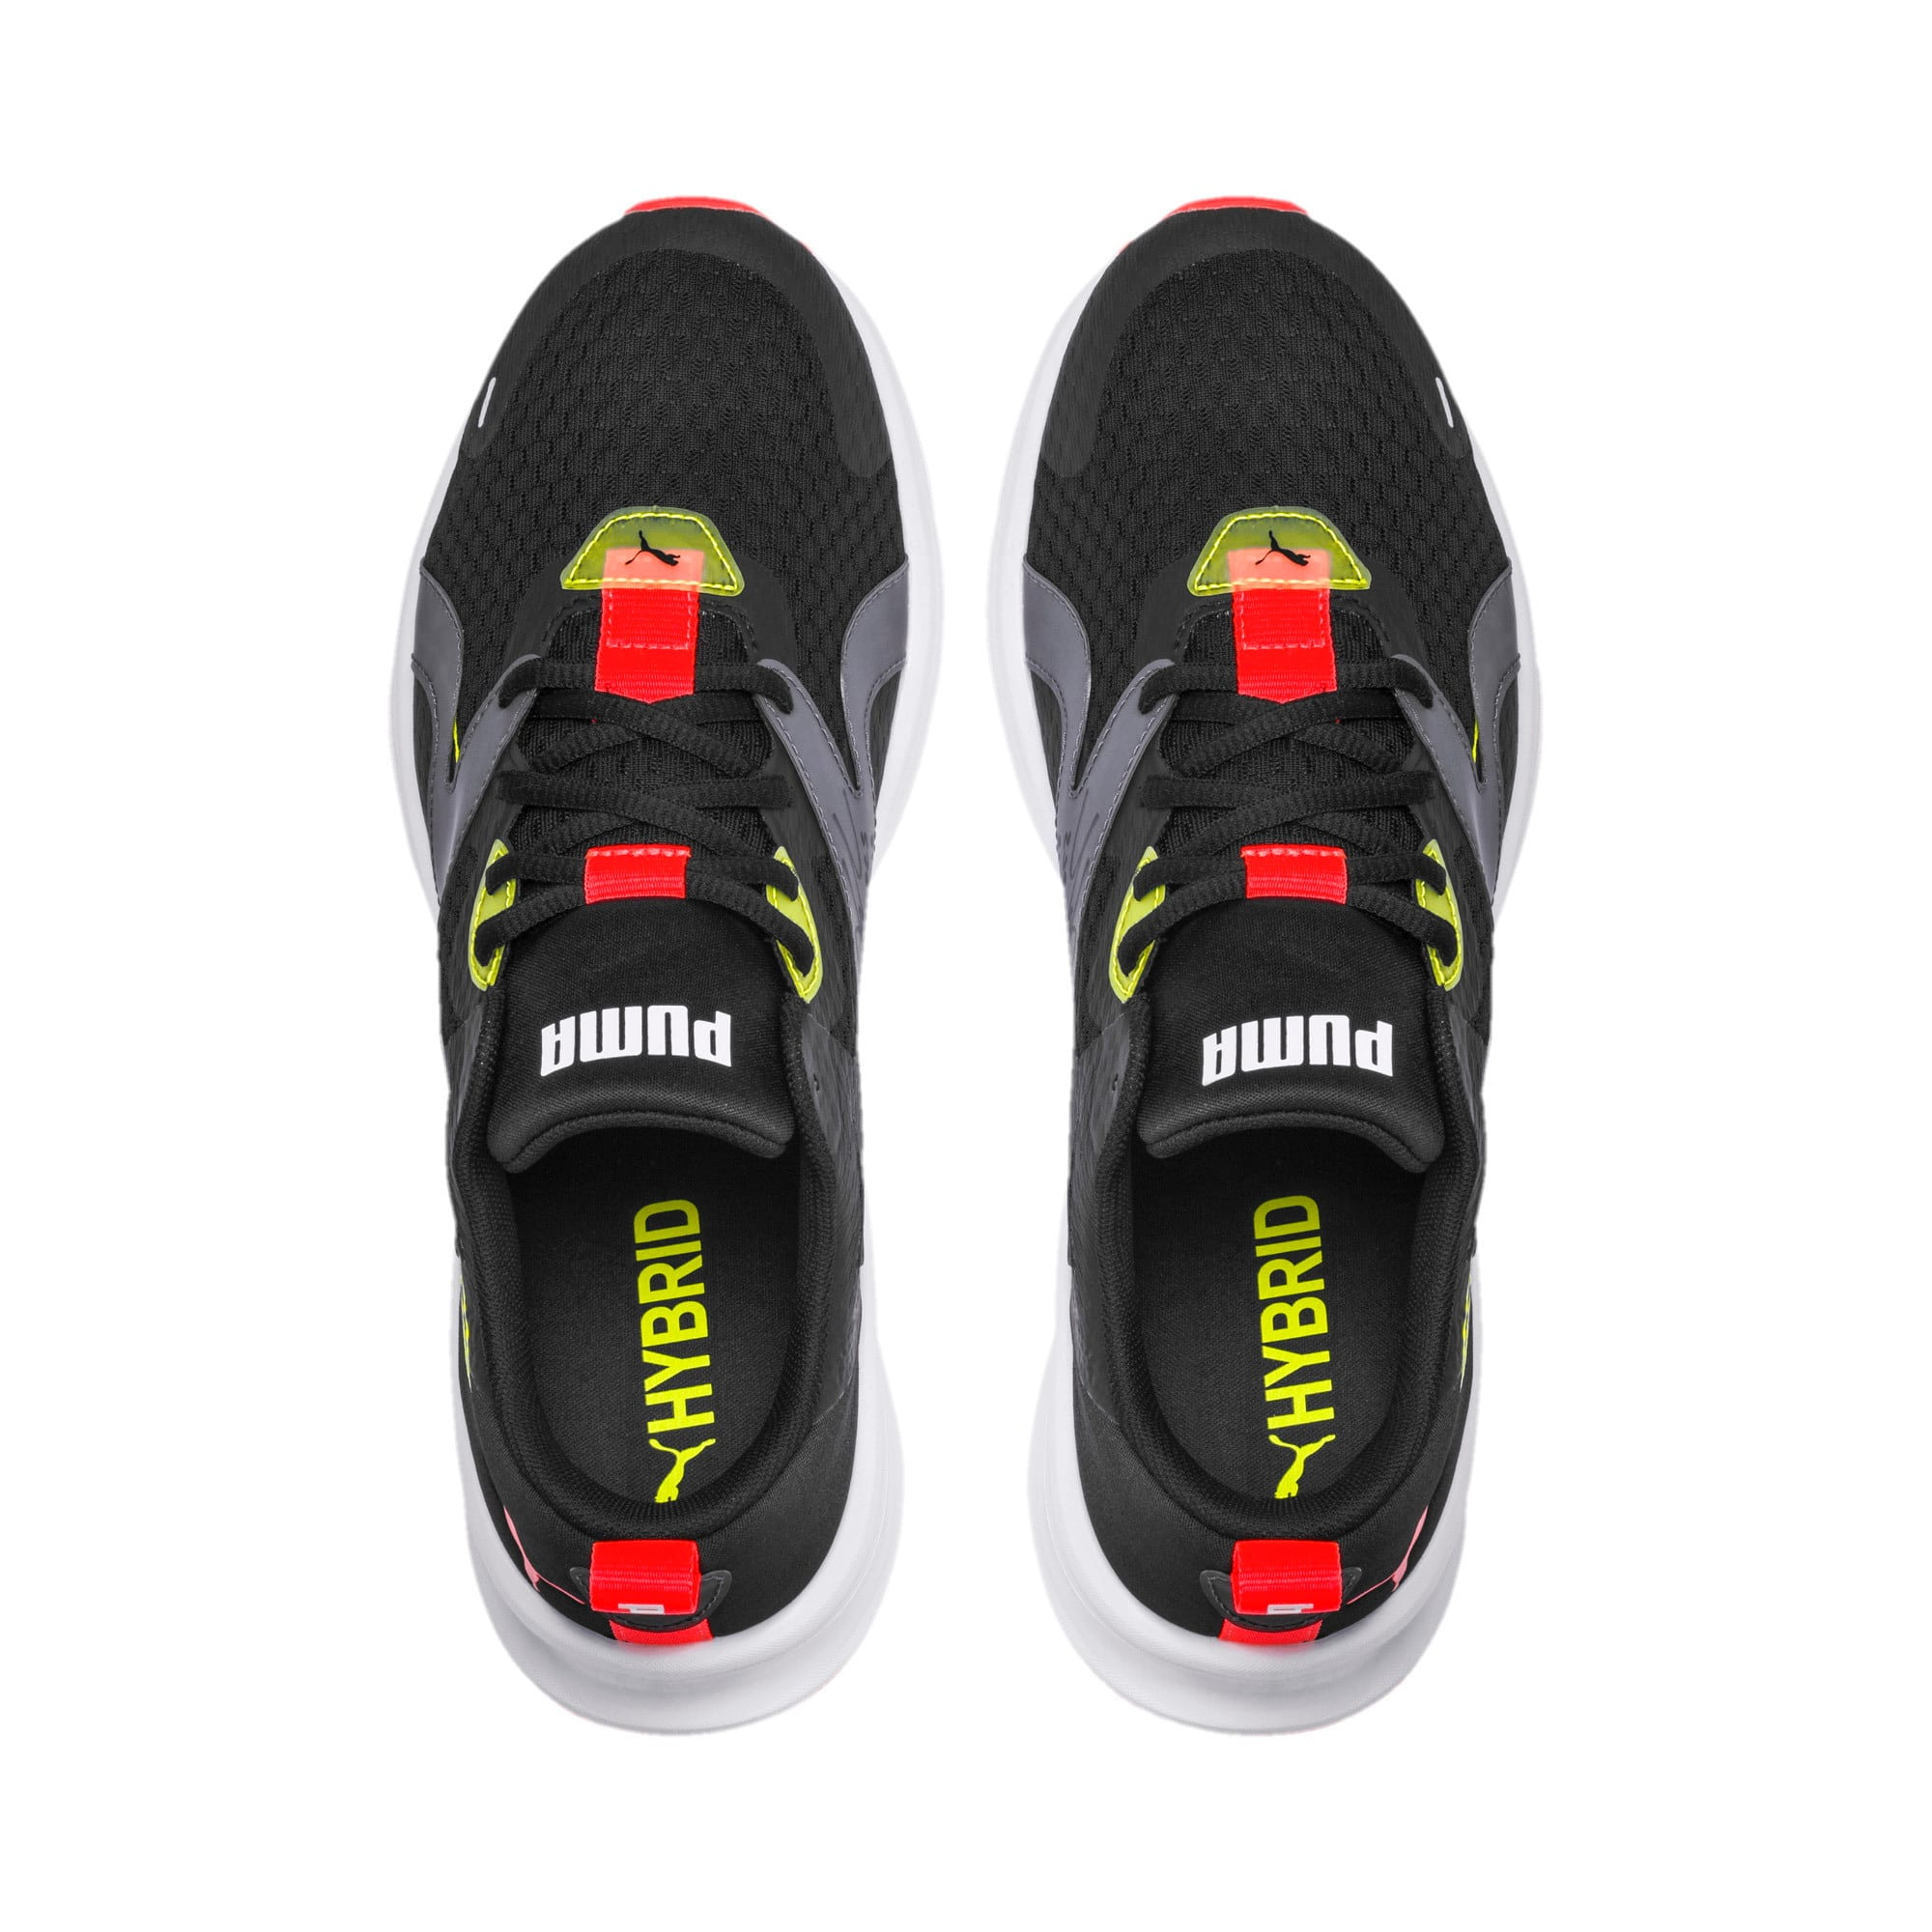 Thumbnail 2 of HYBRID Fuego Men's Running Shoes, Puma Black-Yellow Alert, medium-IND